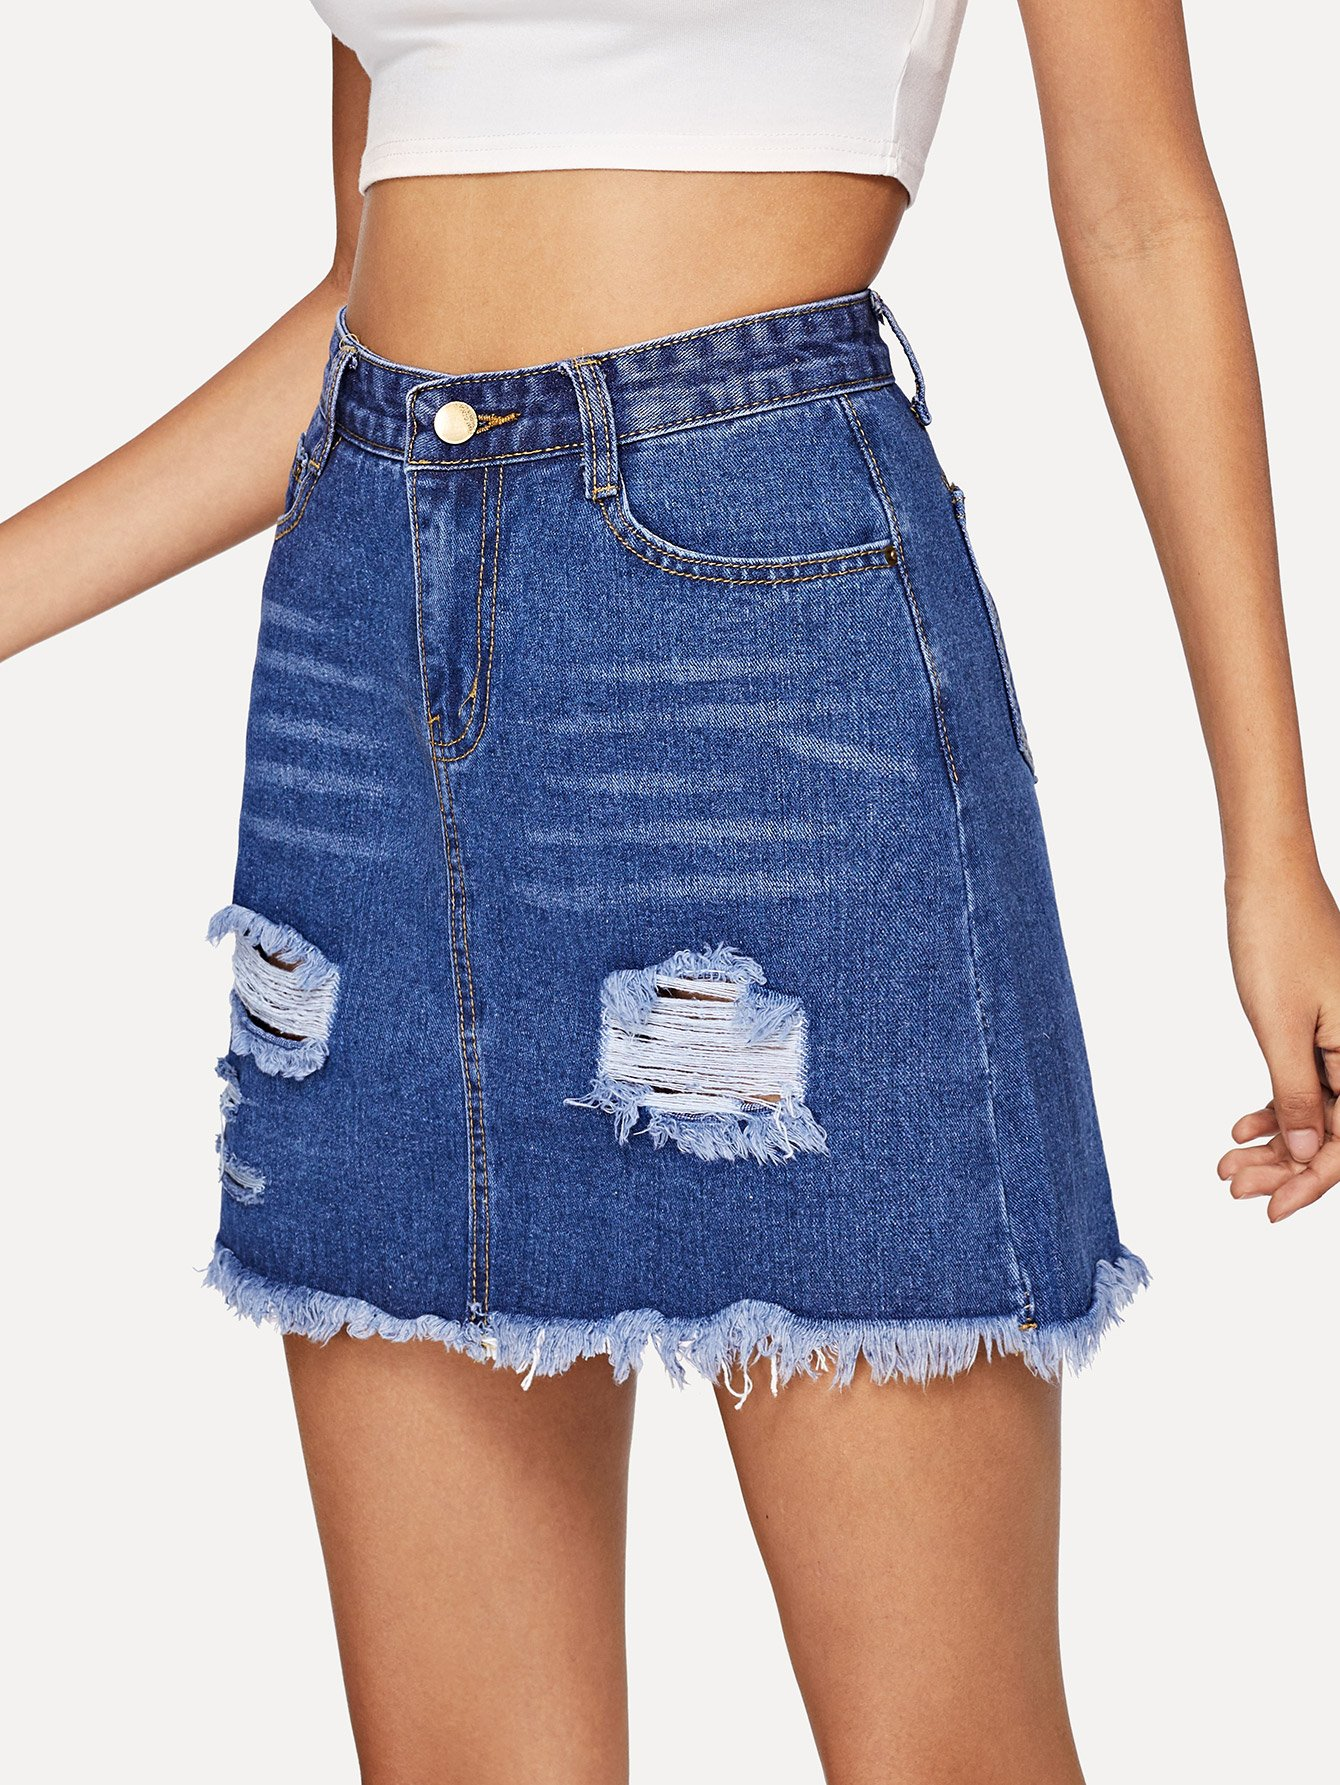 Ripped Raw Hem Denim Skirt girls single breasted raw hem skirt